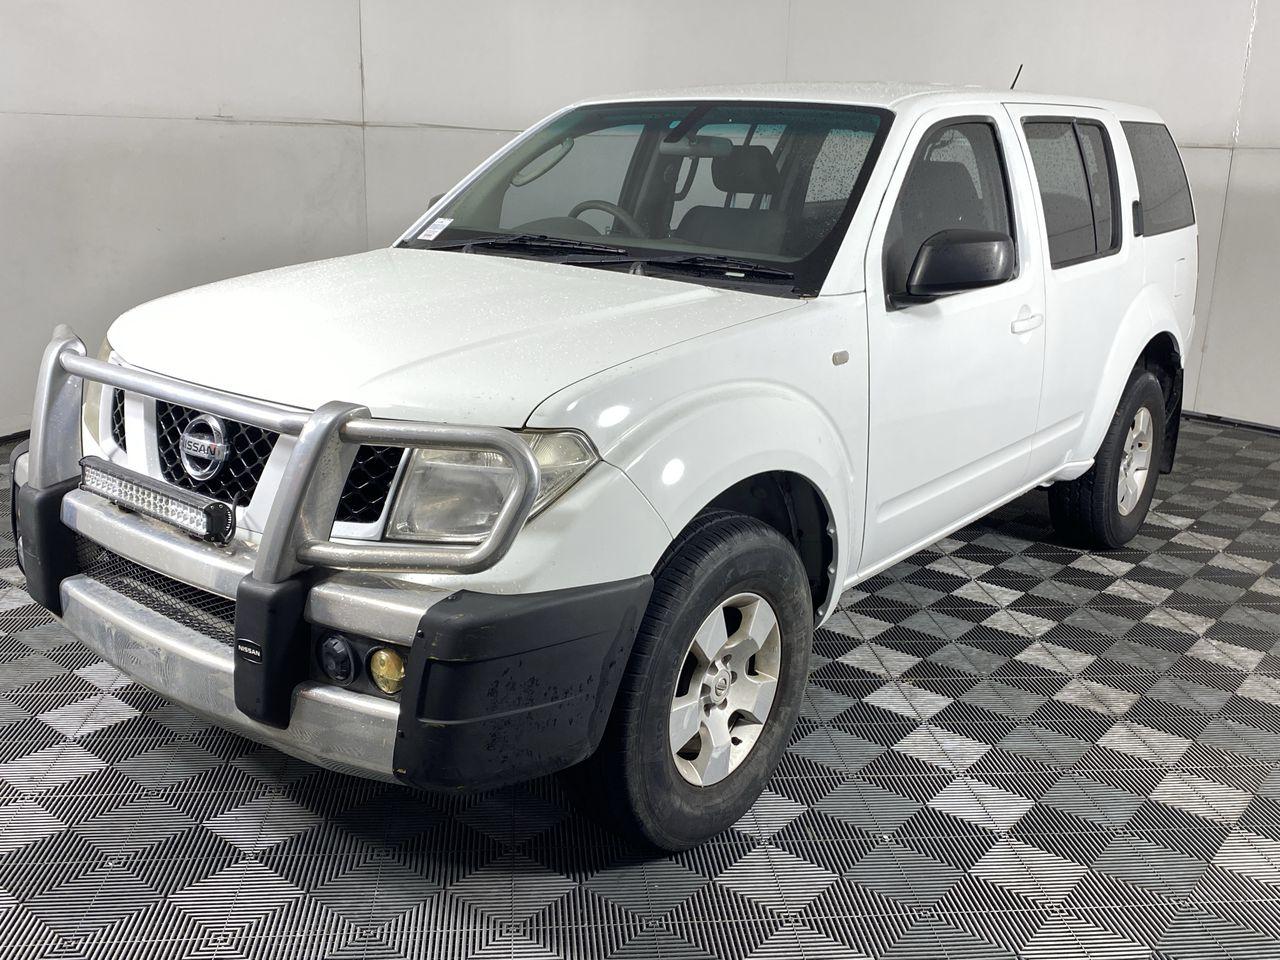 2005 Nissan Pathfinder ST (4x4) R51 Automatic 7 Seats Wagon